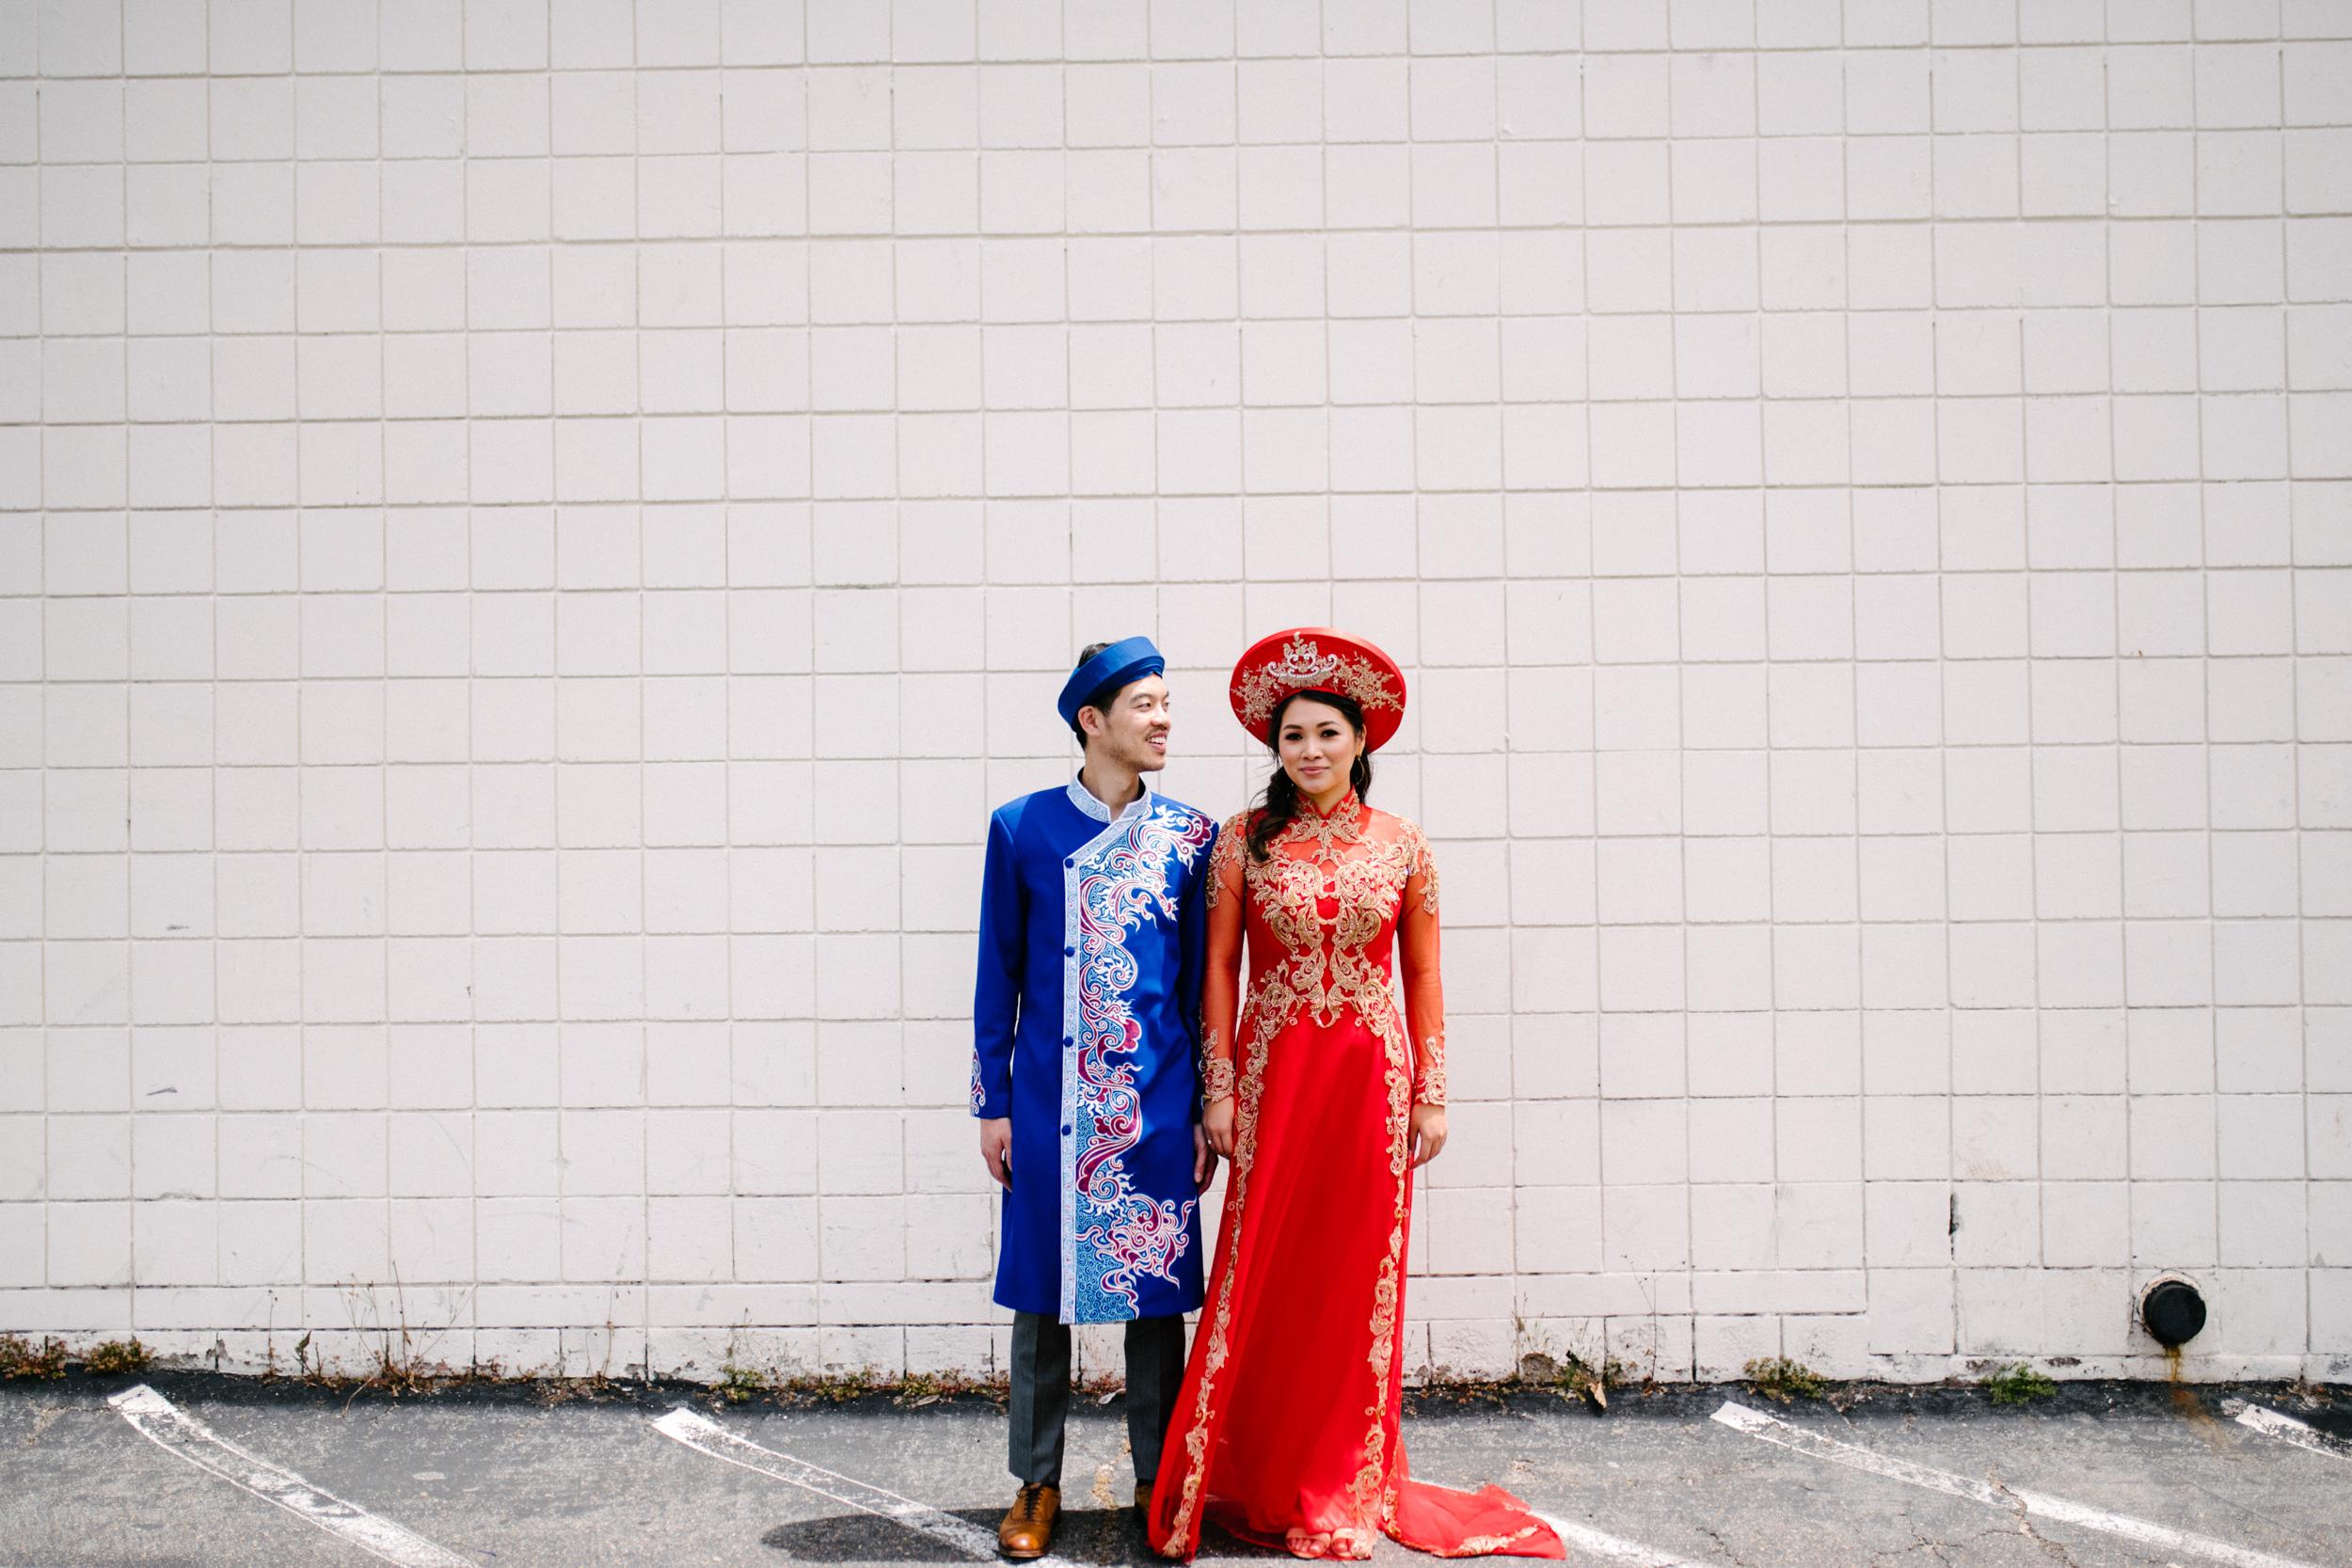 wedding_coronado_community_center-2.jpg